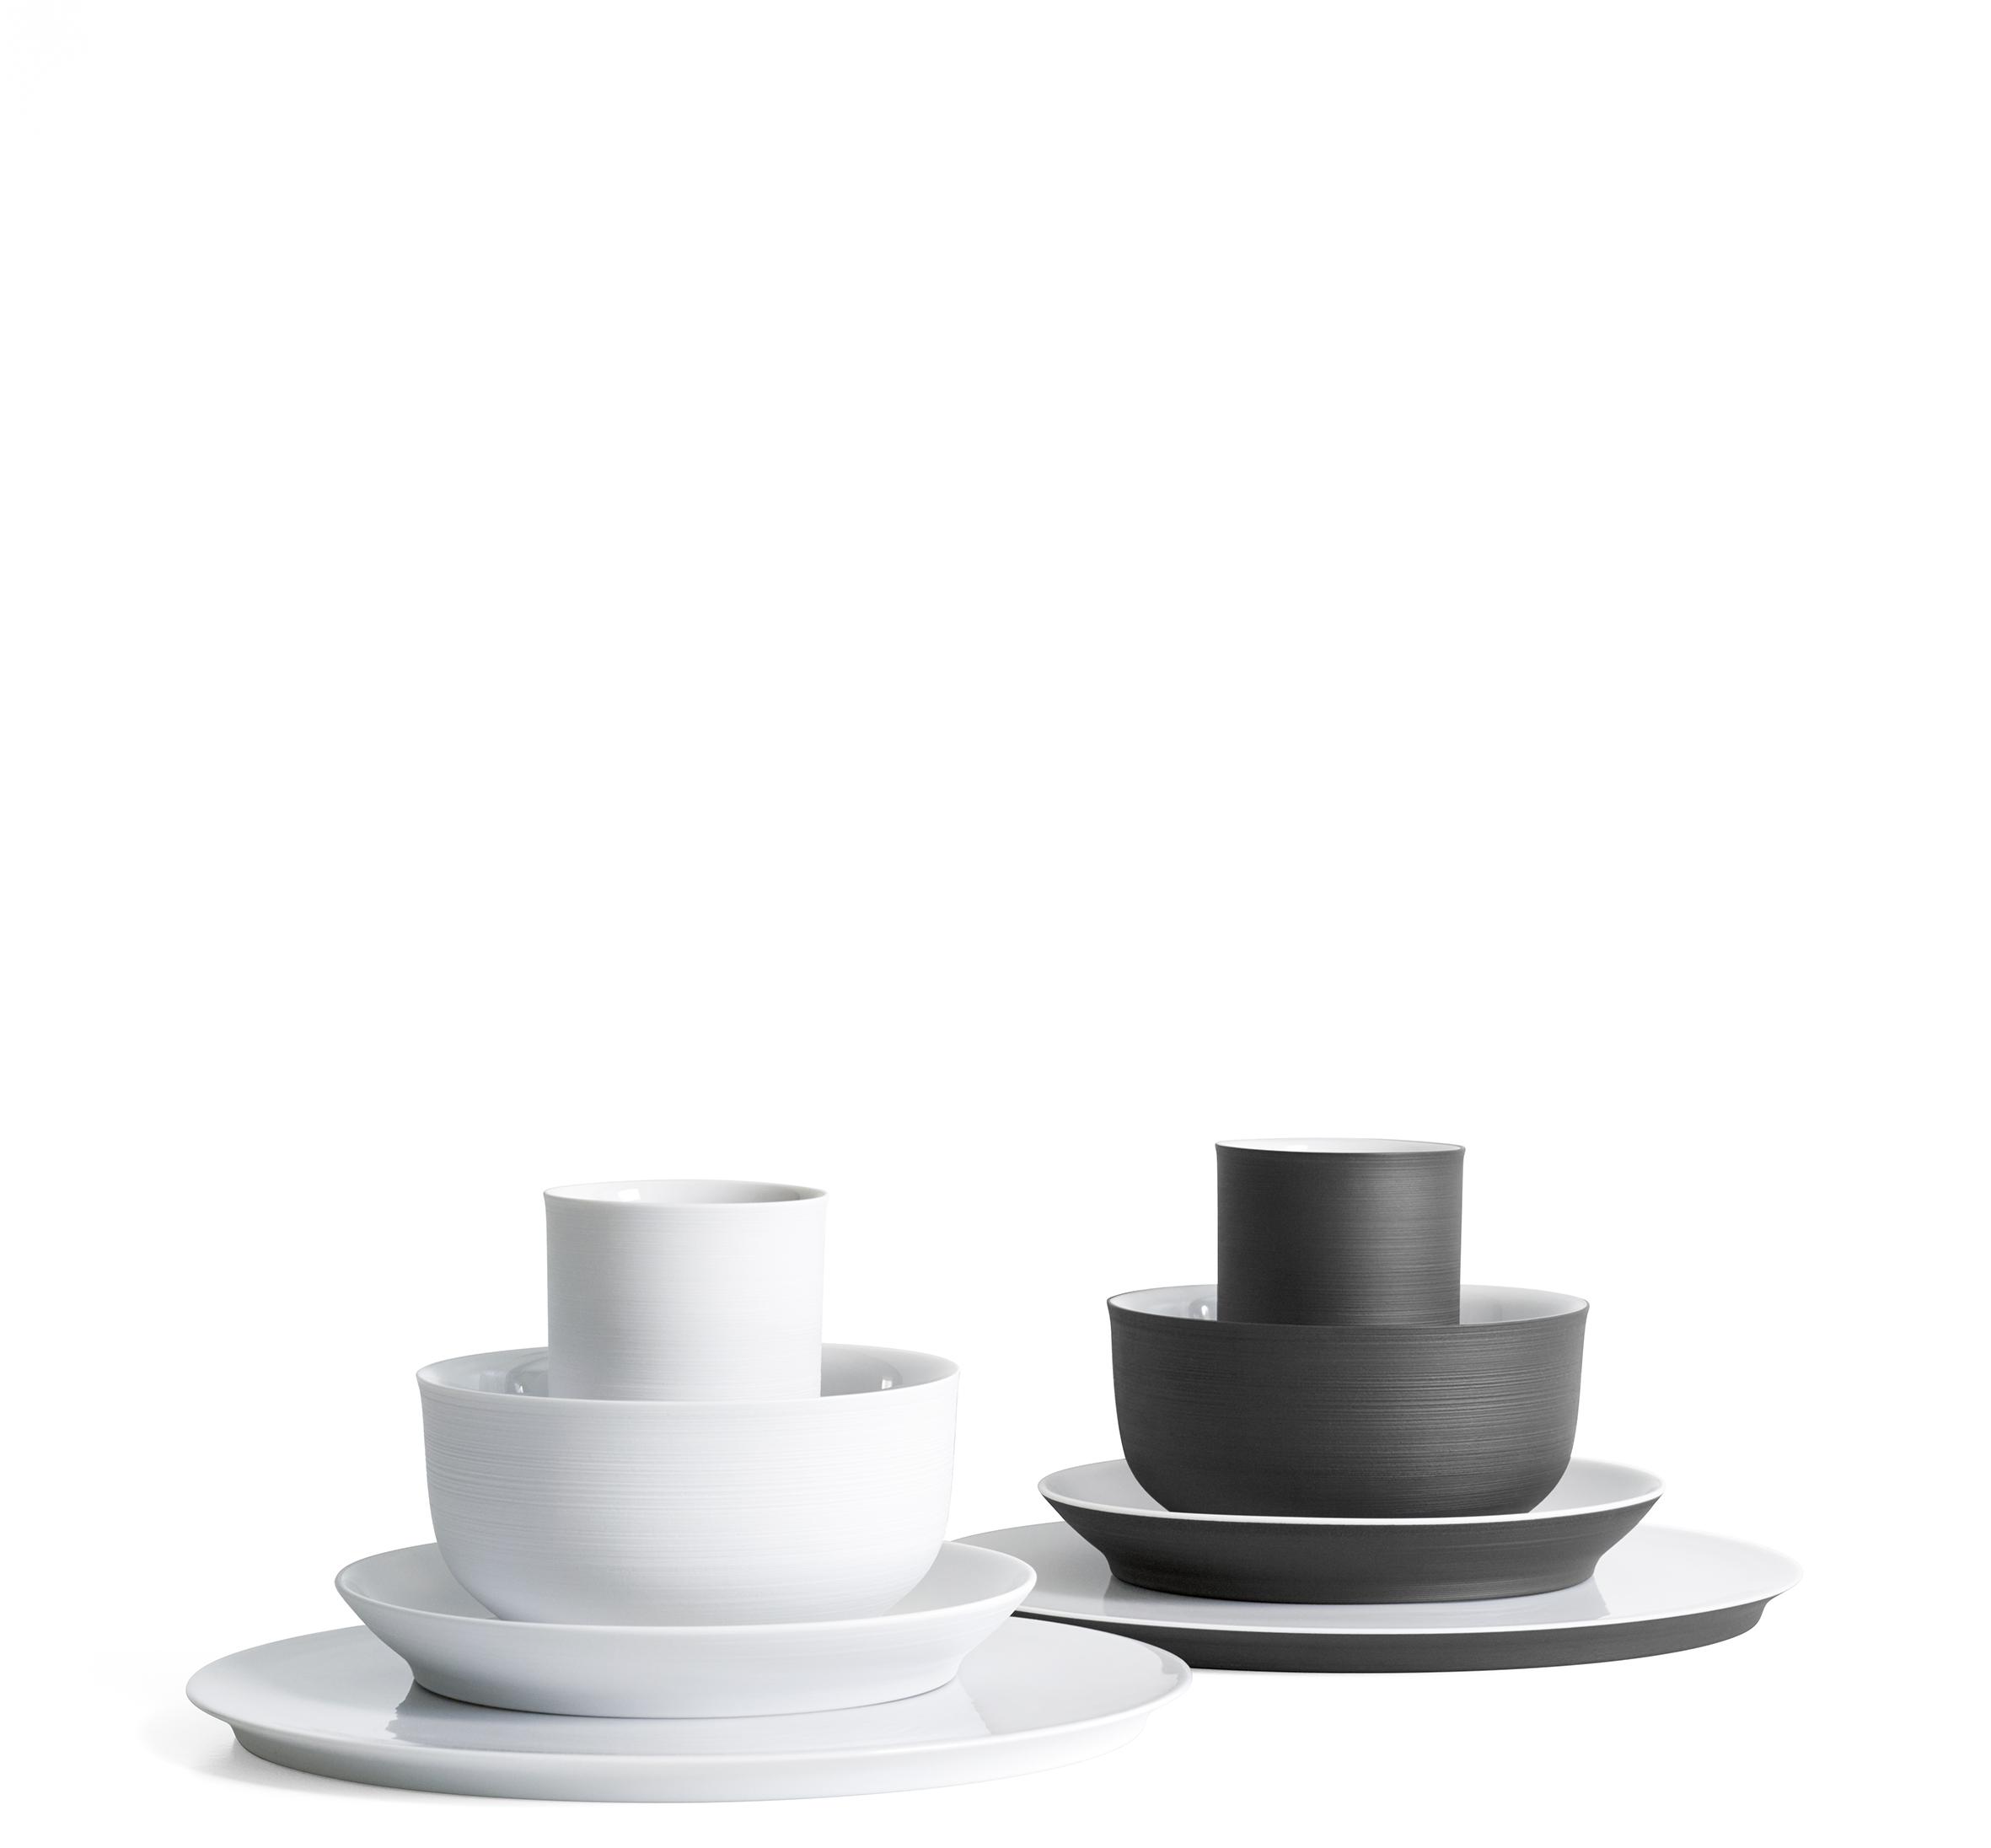 A essence of modern tableware